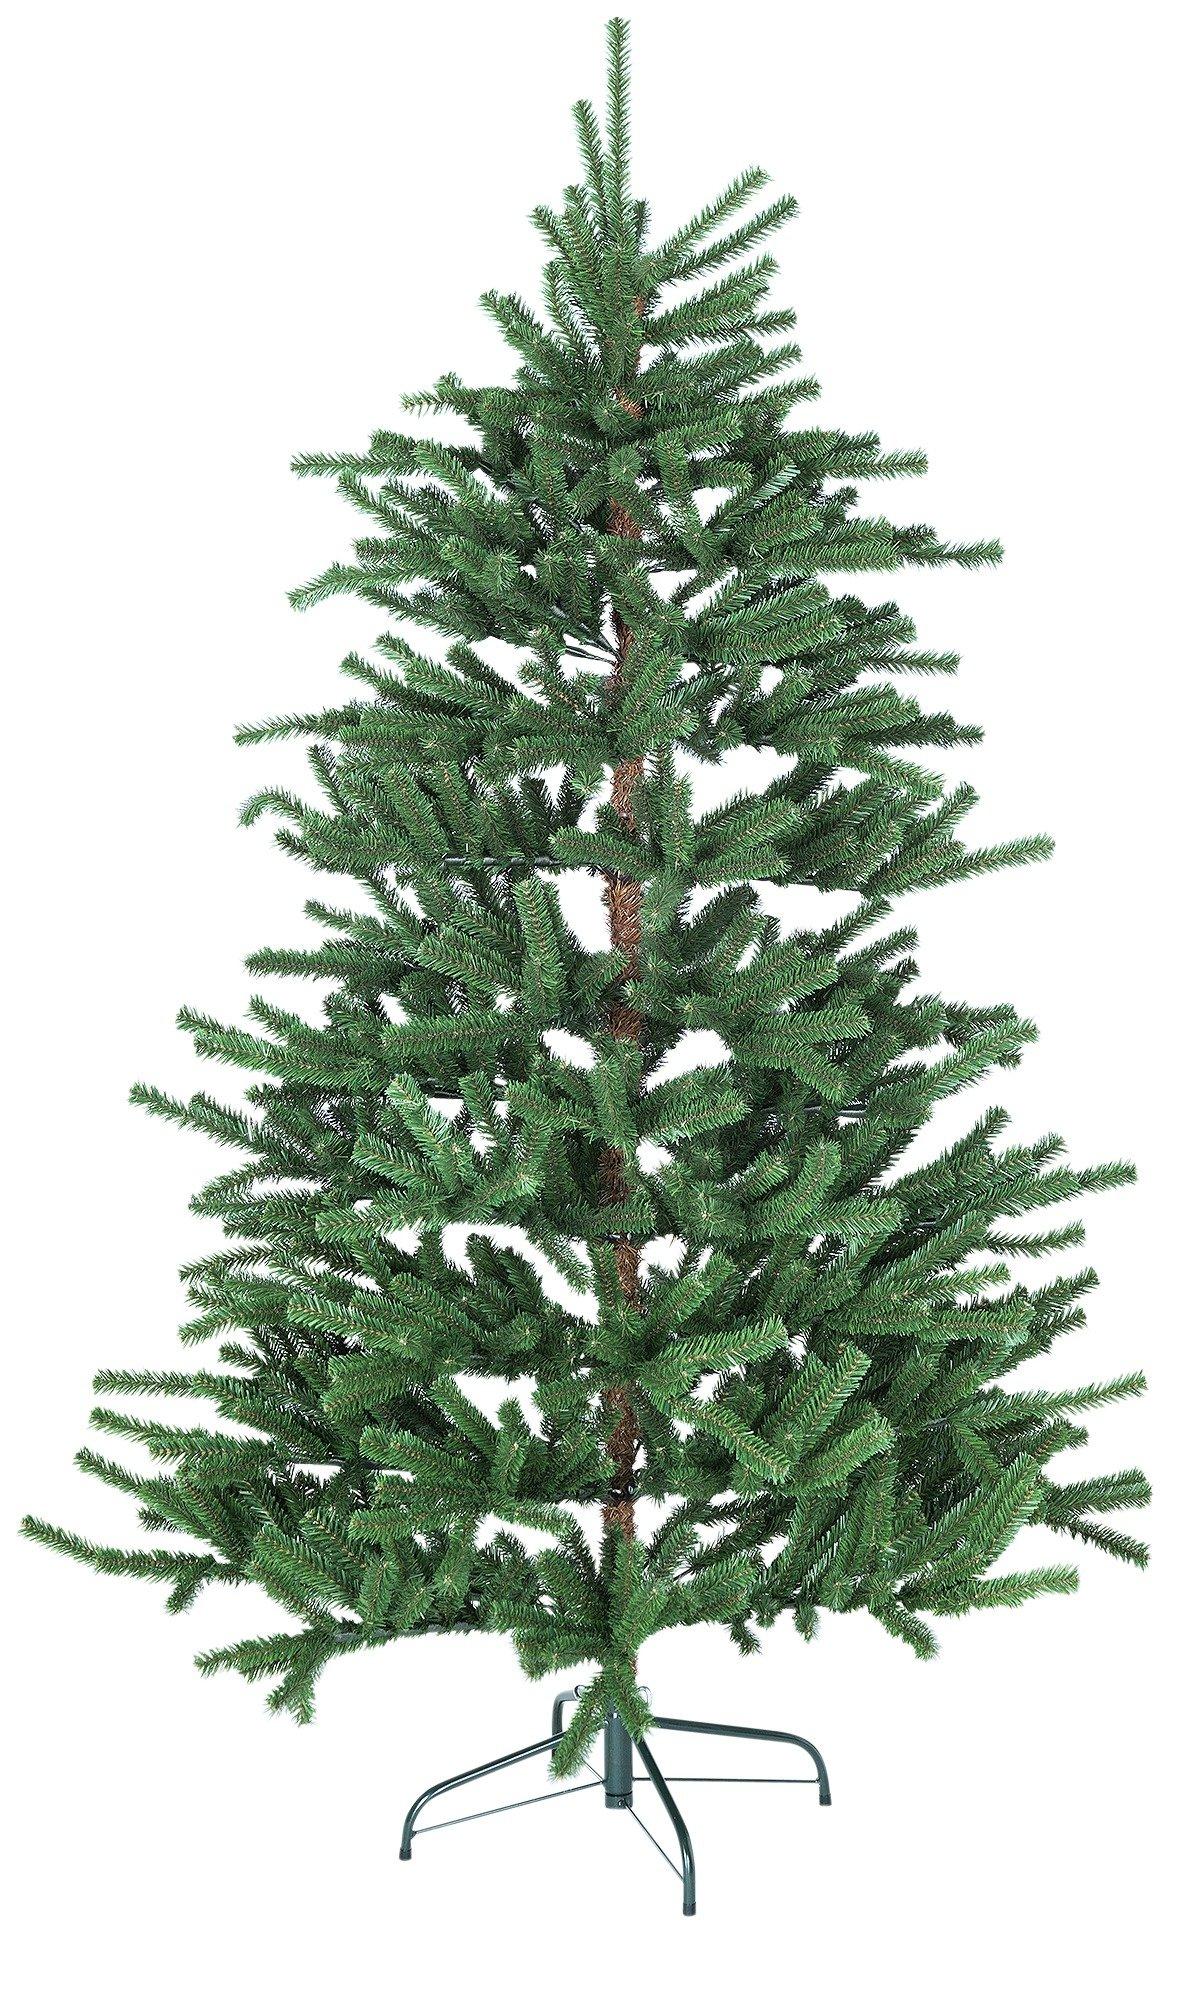 Green Nordic Christmas Tree - 6ft